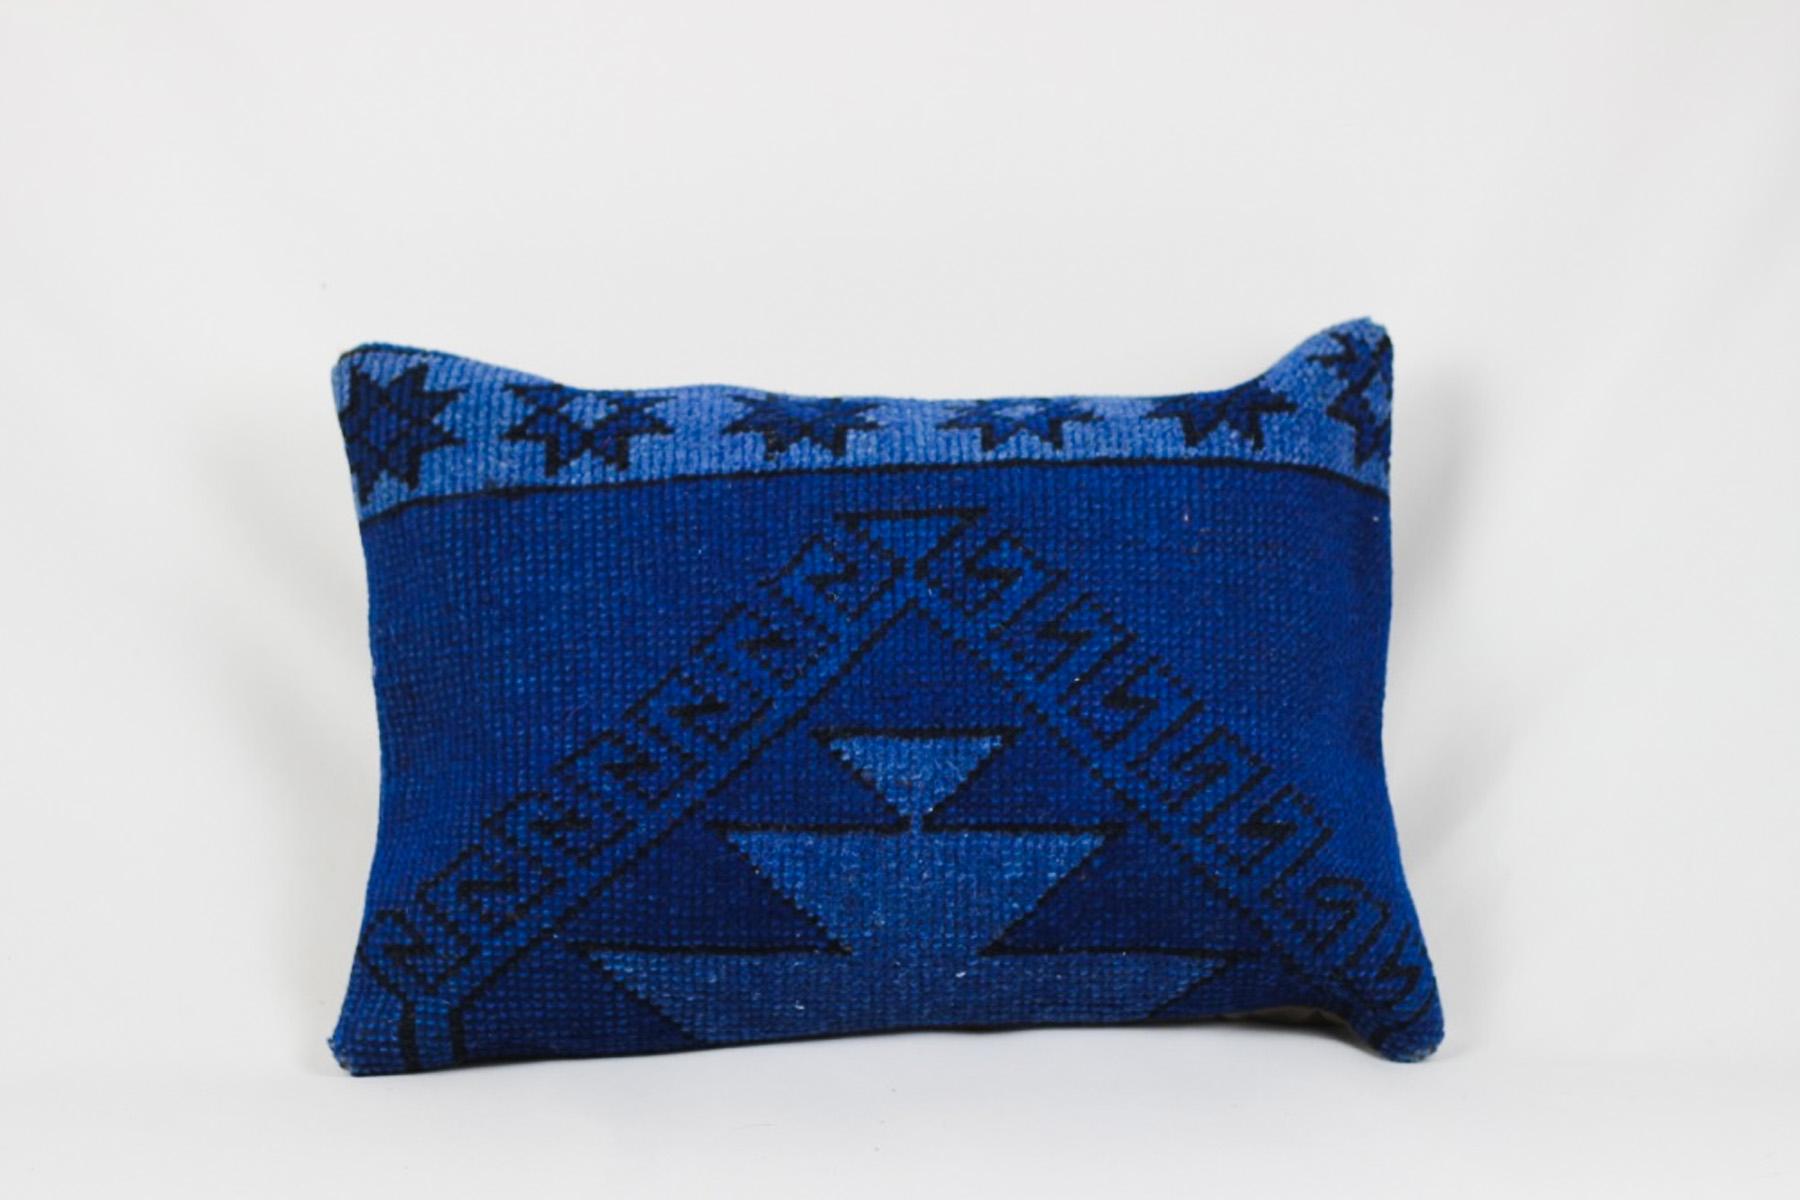 Blue Killim Pillow - Scavenged Vintage Rentals